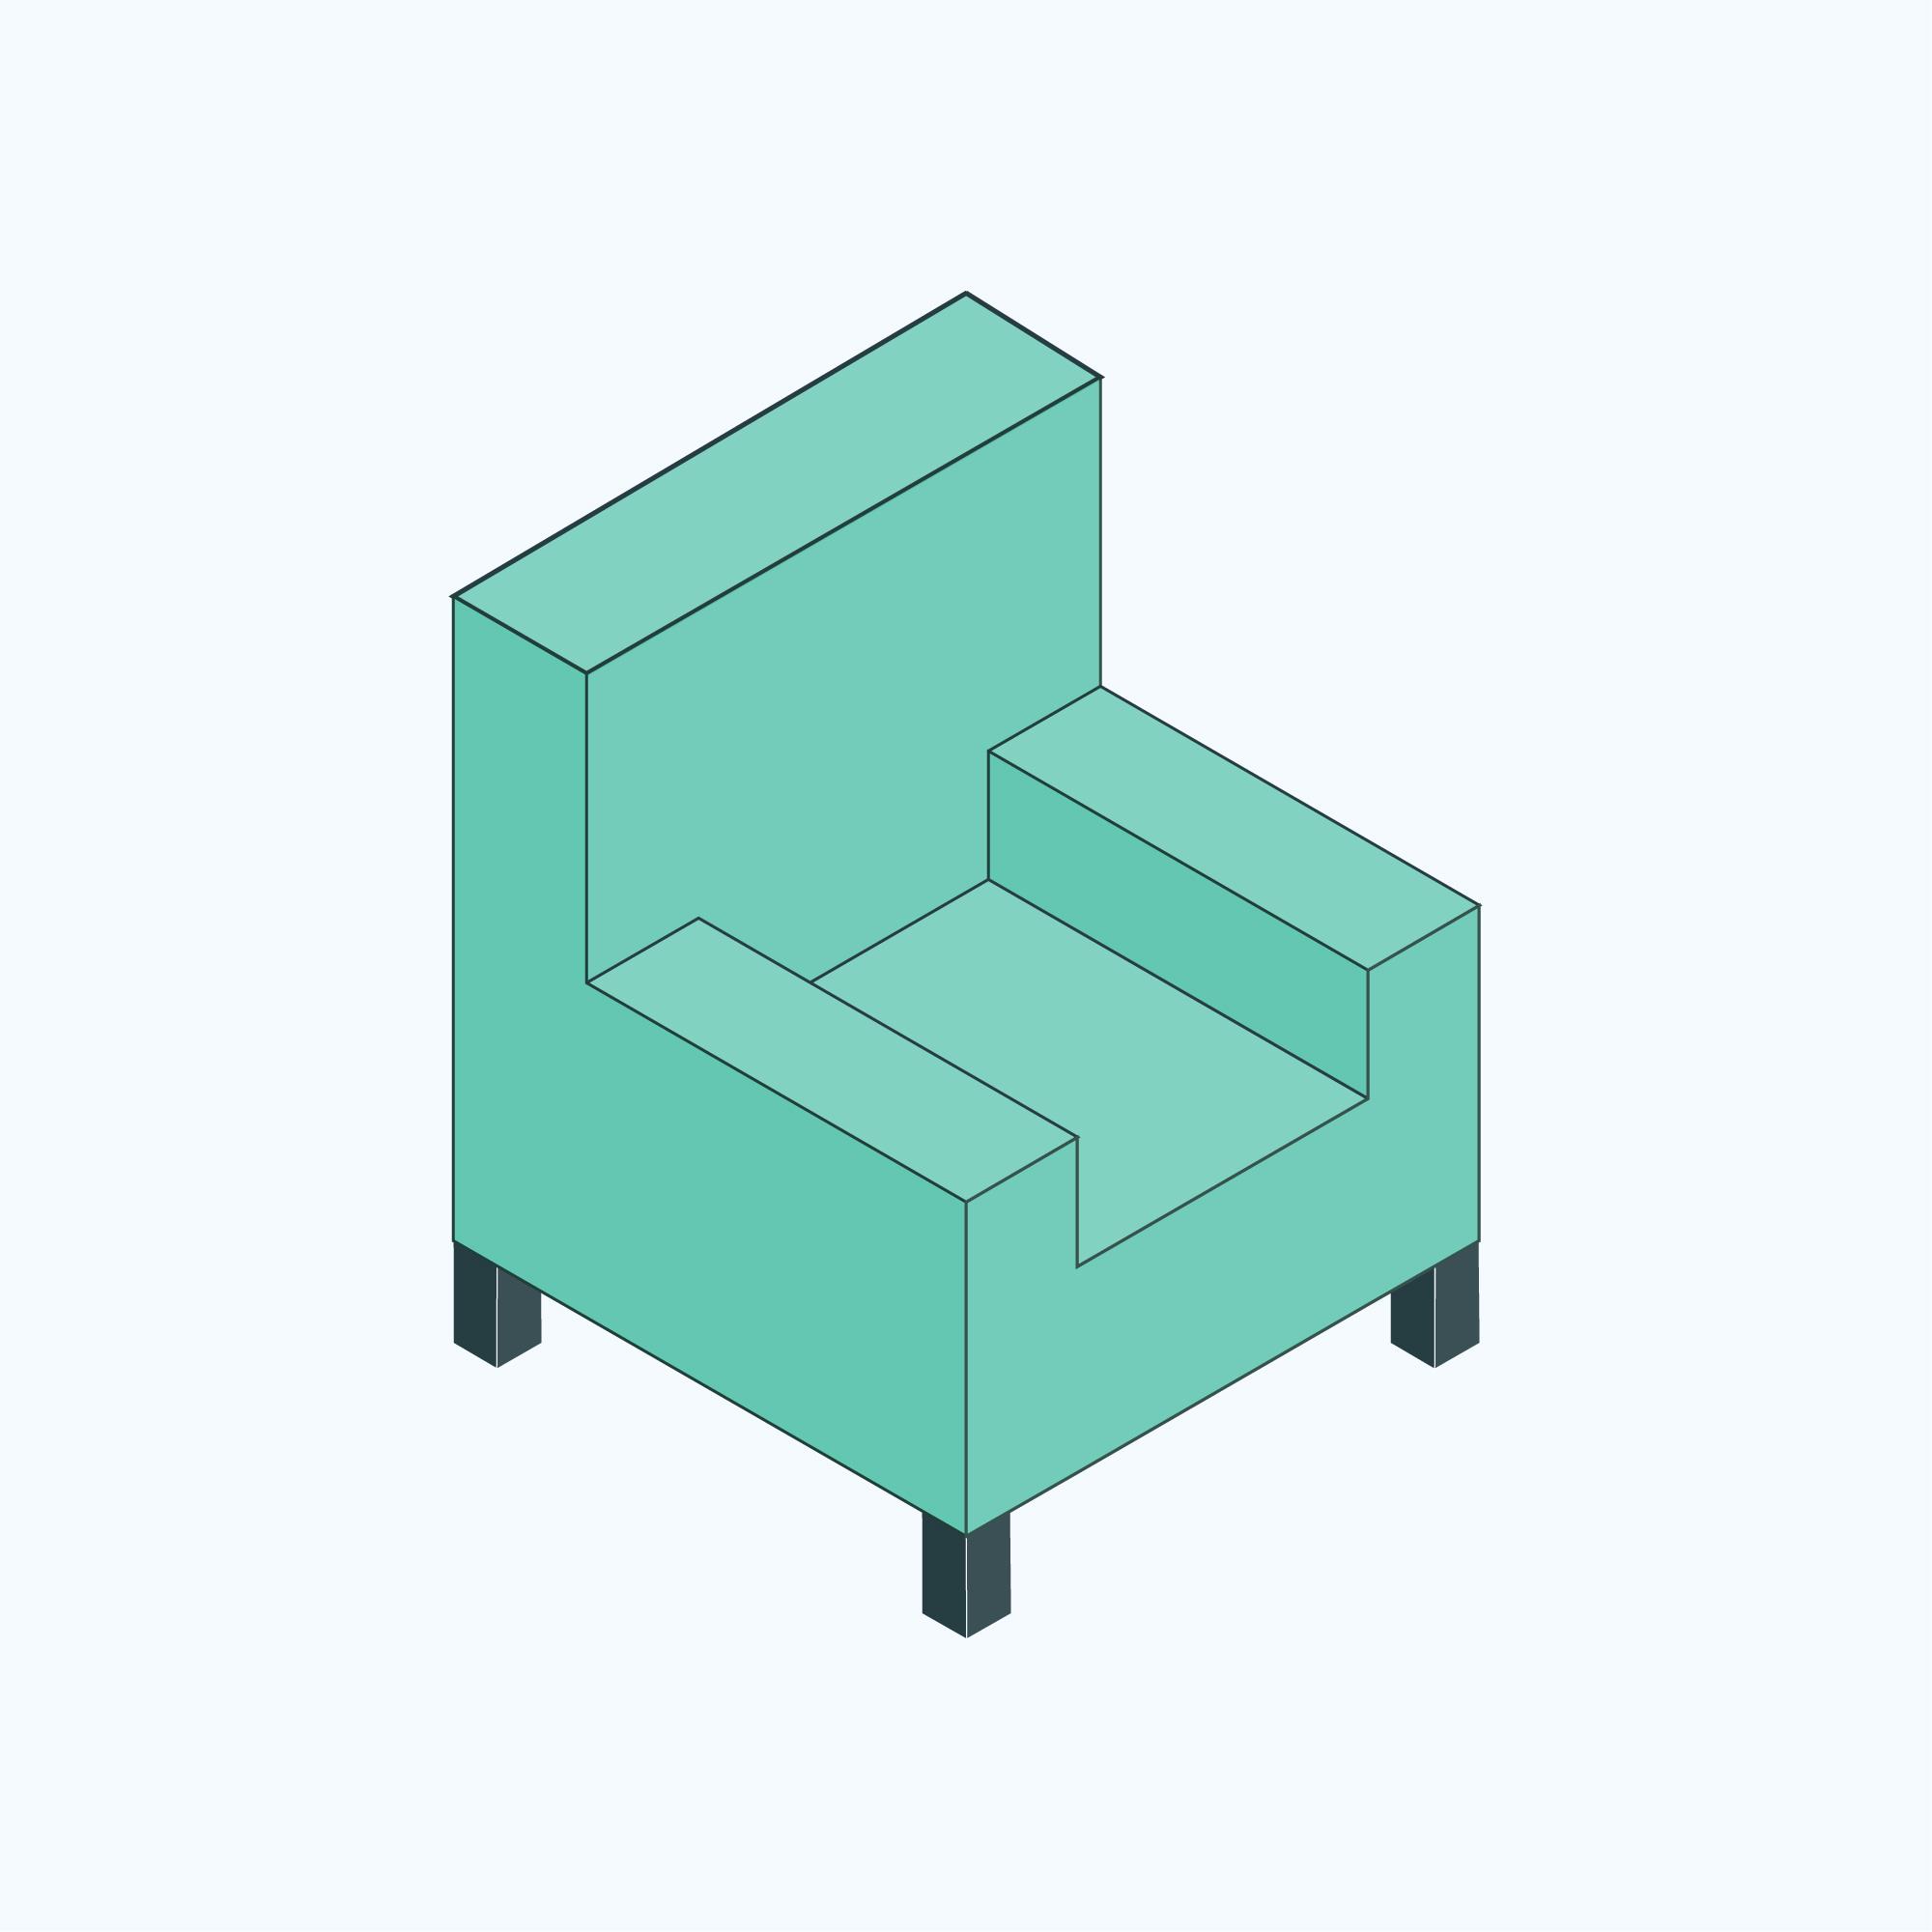 5_IsometricCouch.jpg